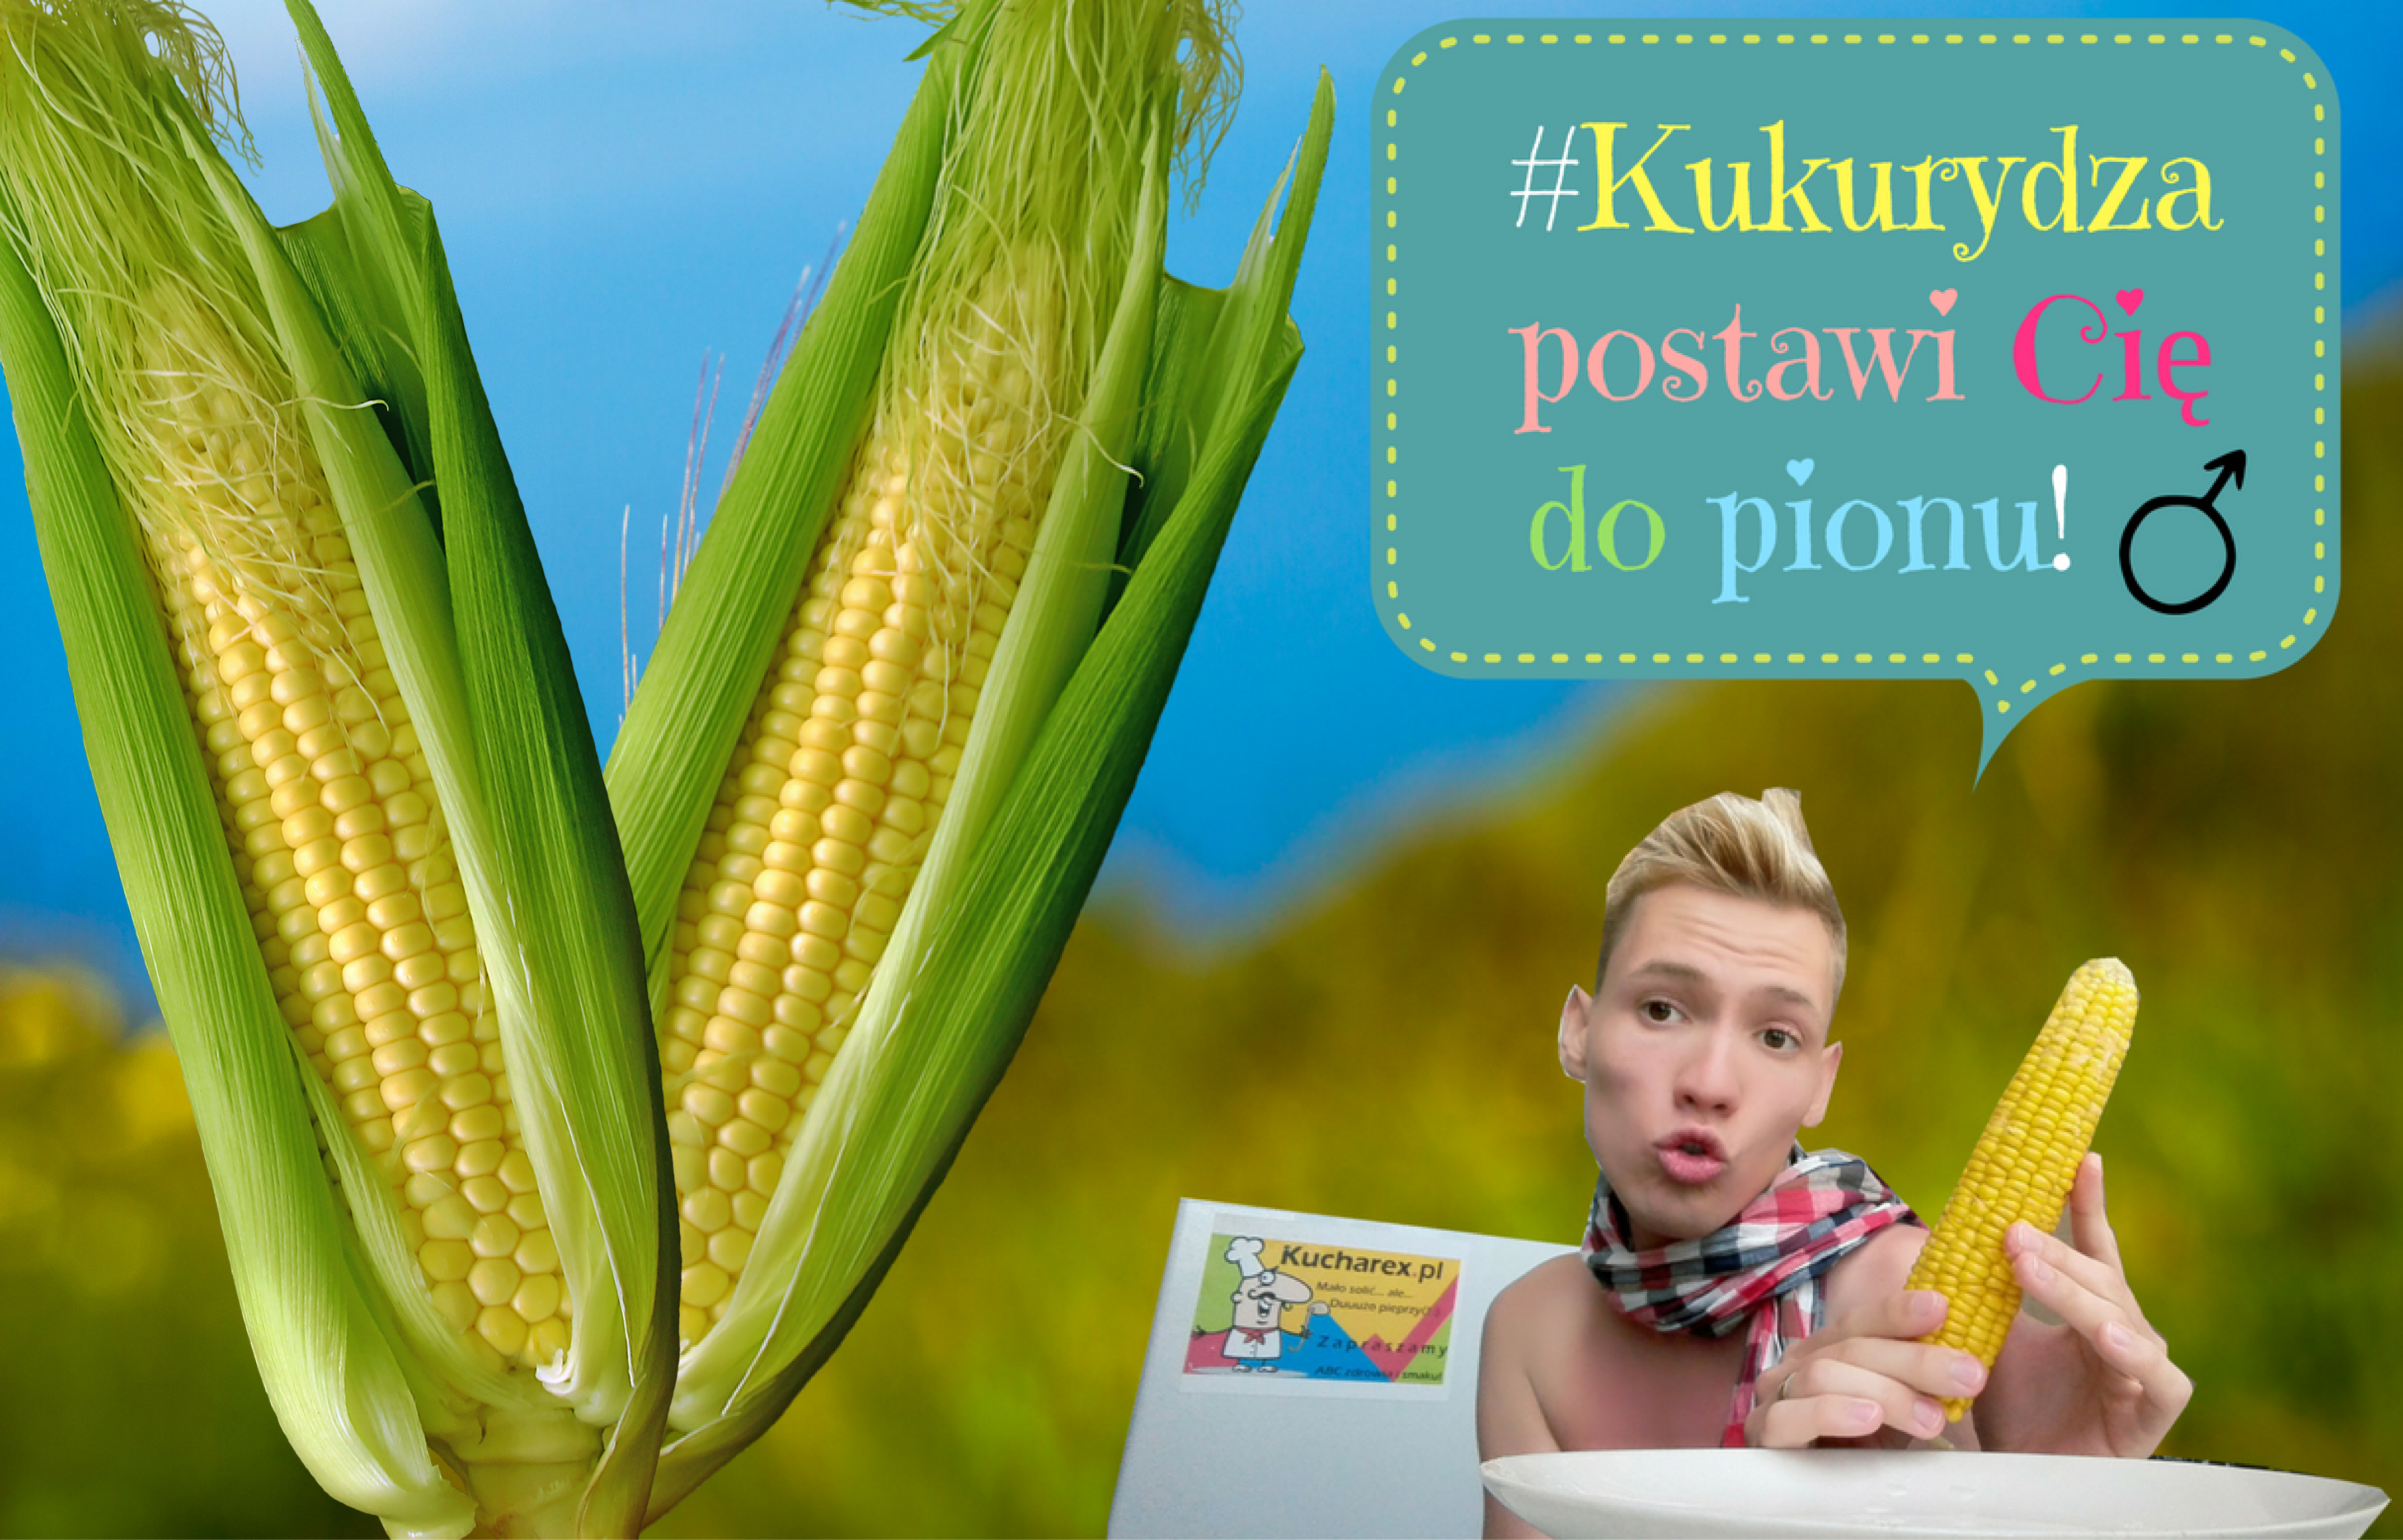 #Kukurydza postawi Cię do pionu! ♂ ☺